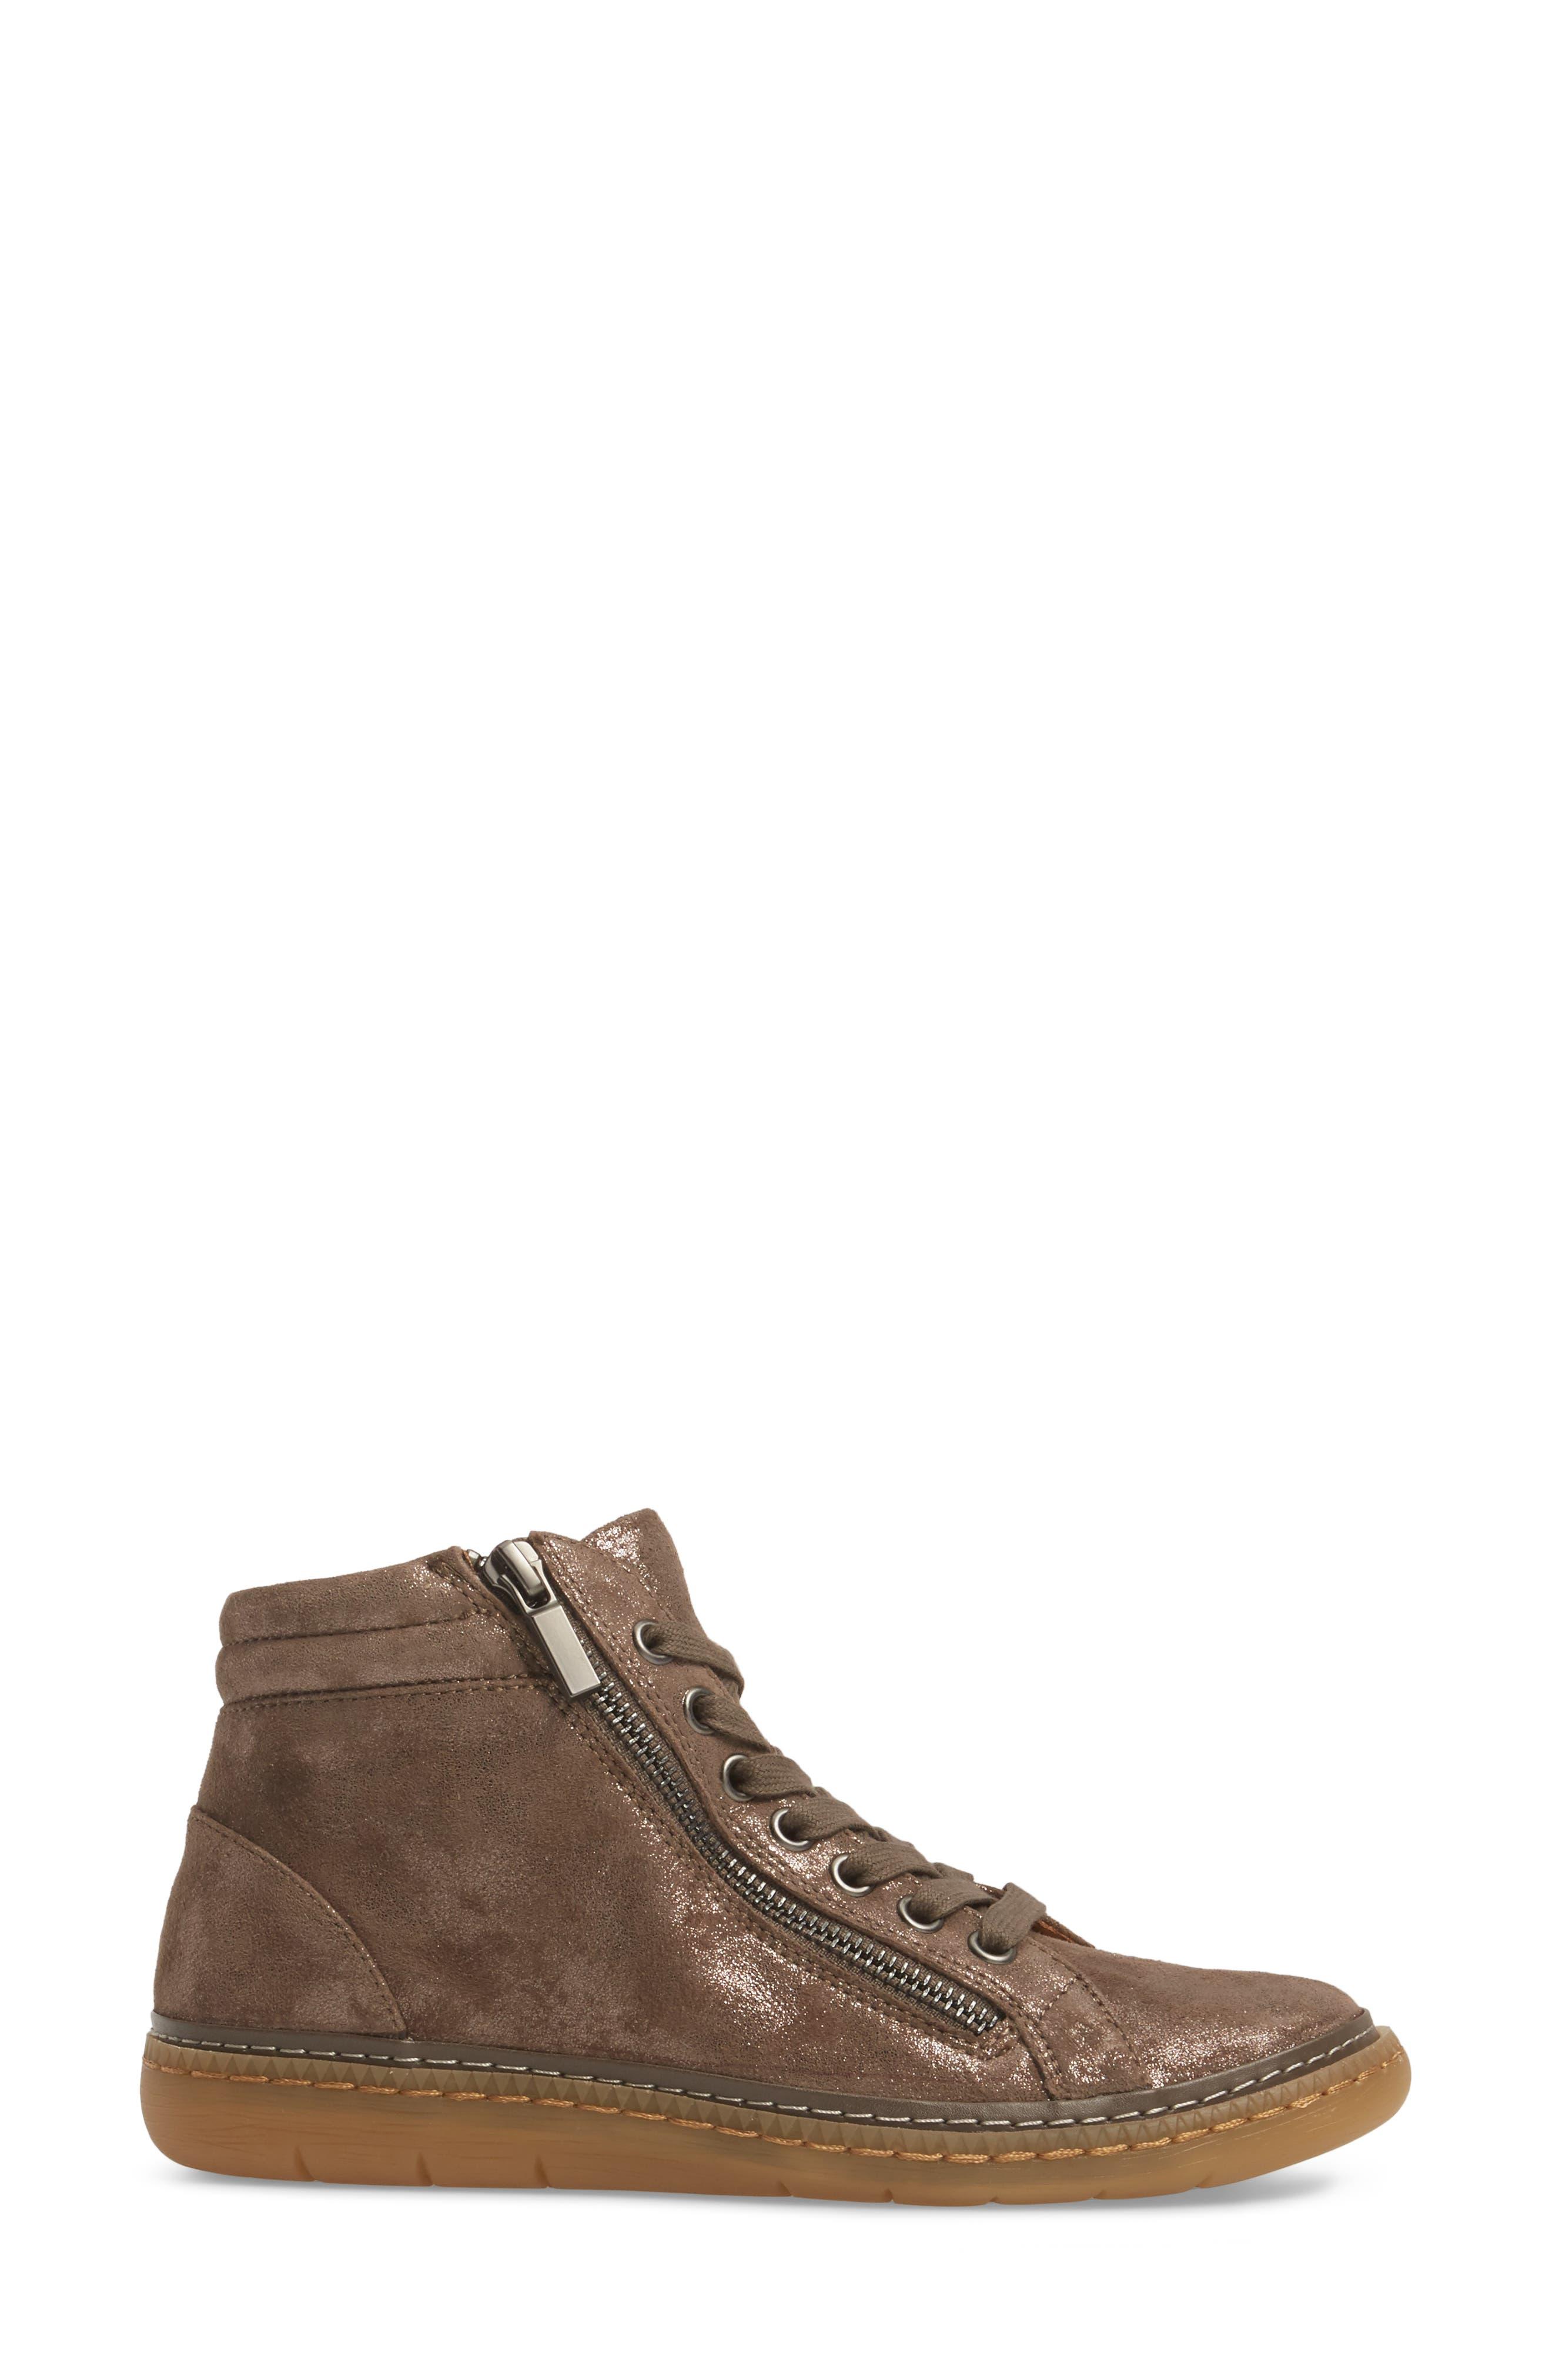 SÖFFT, Annaleigh High Top Sneaker, Alternate thumbnail 3, color, SMOKE FOIL SUEDE